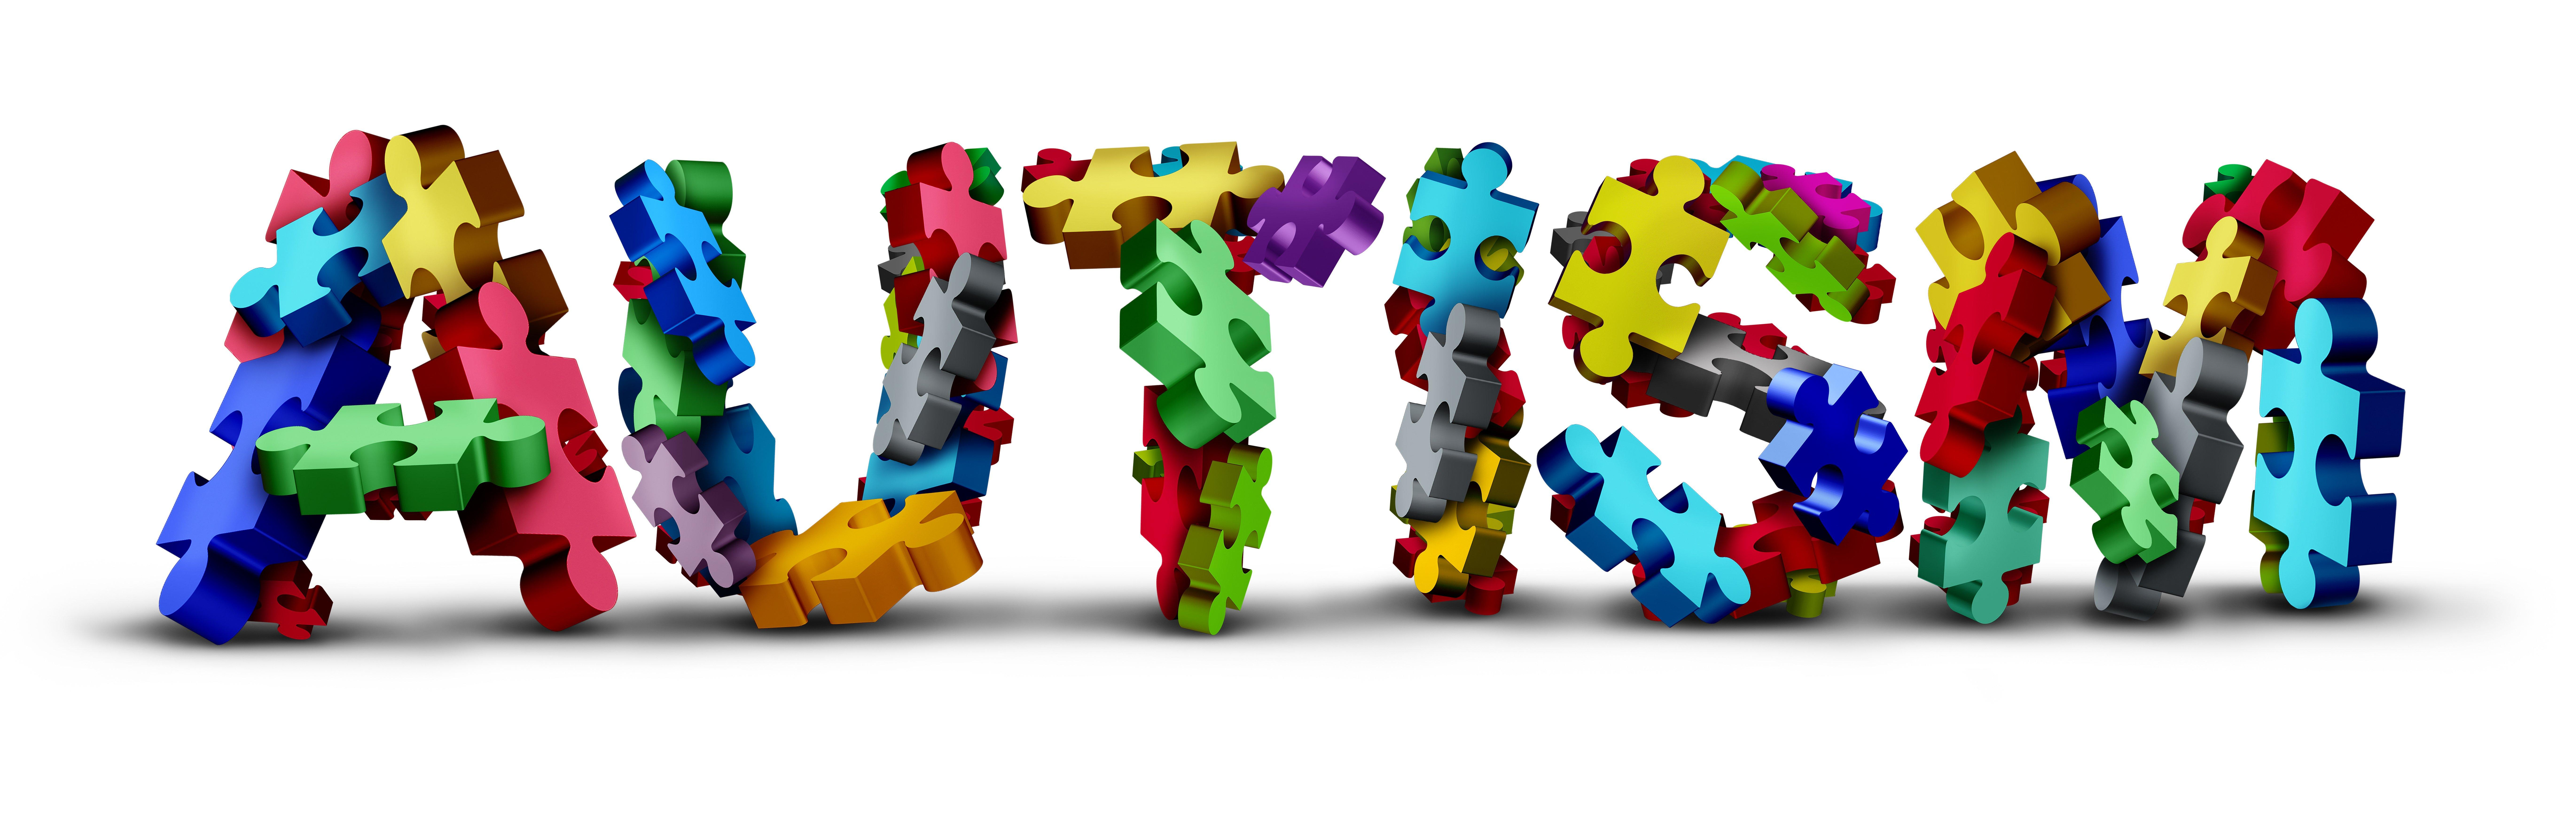 autism letters spelt out using jigsaw puzzle pieces